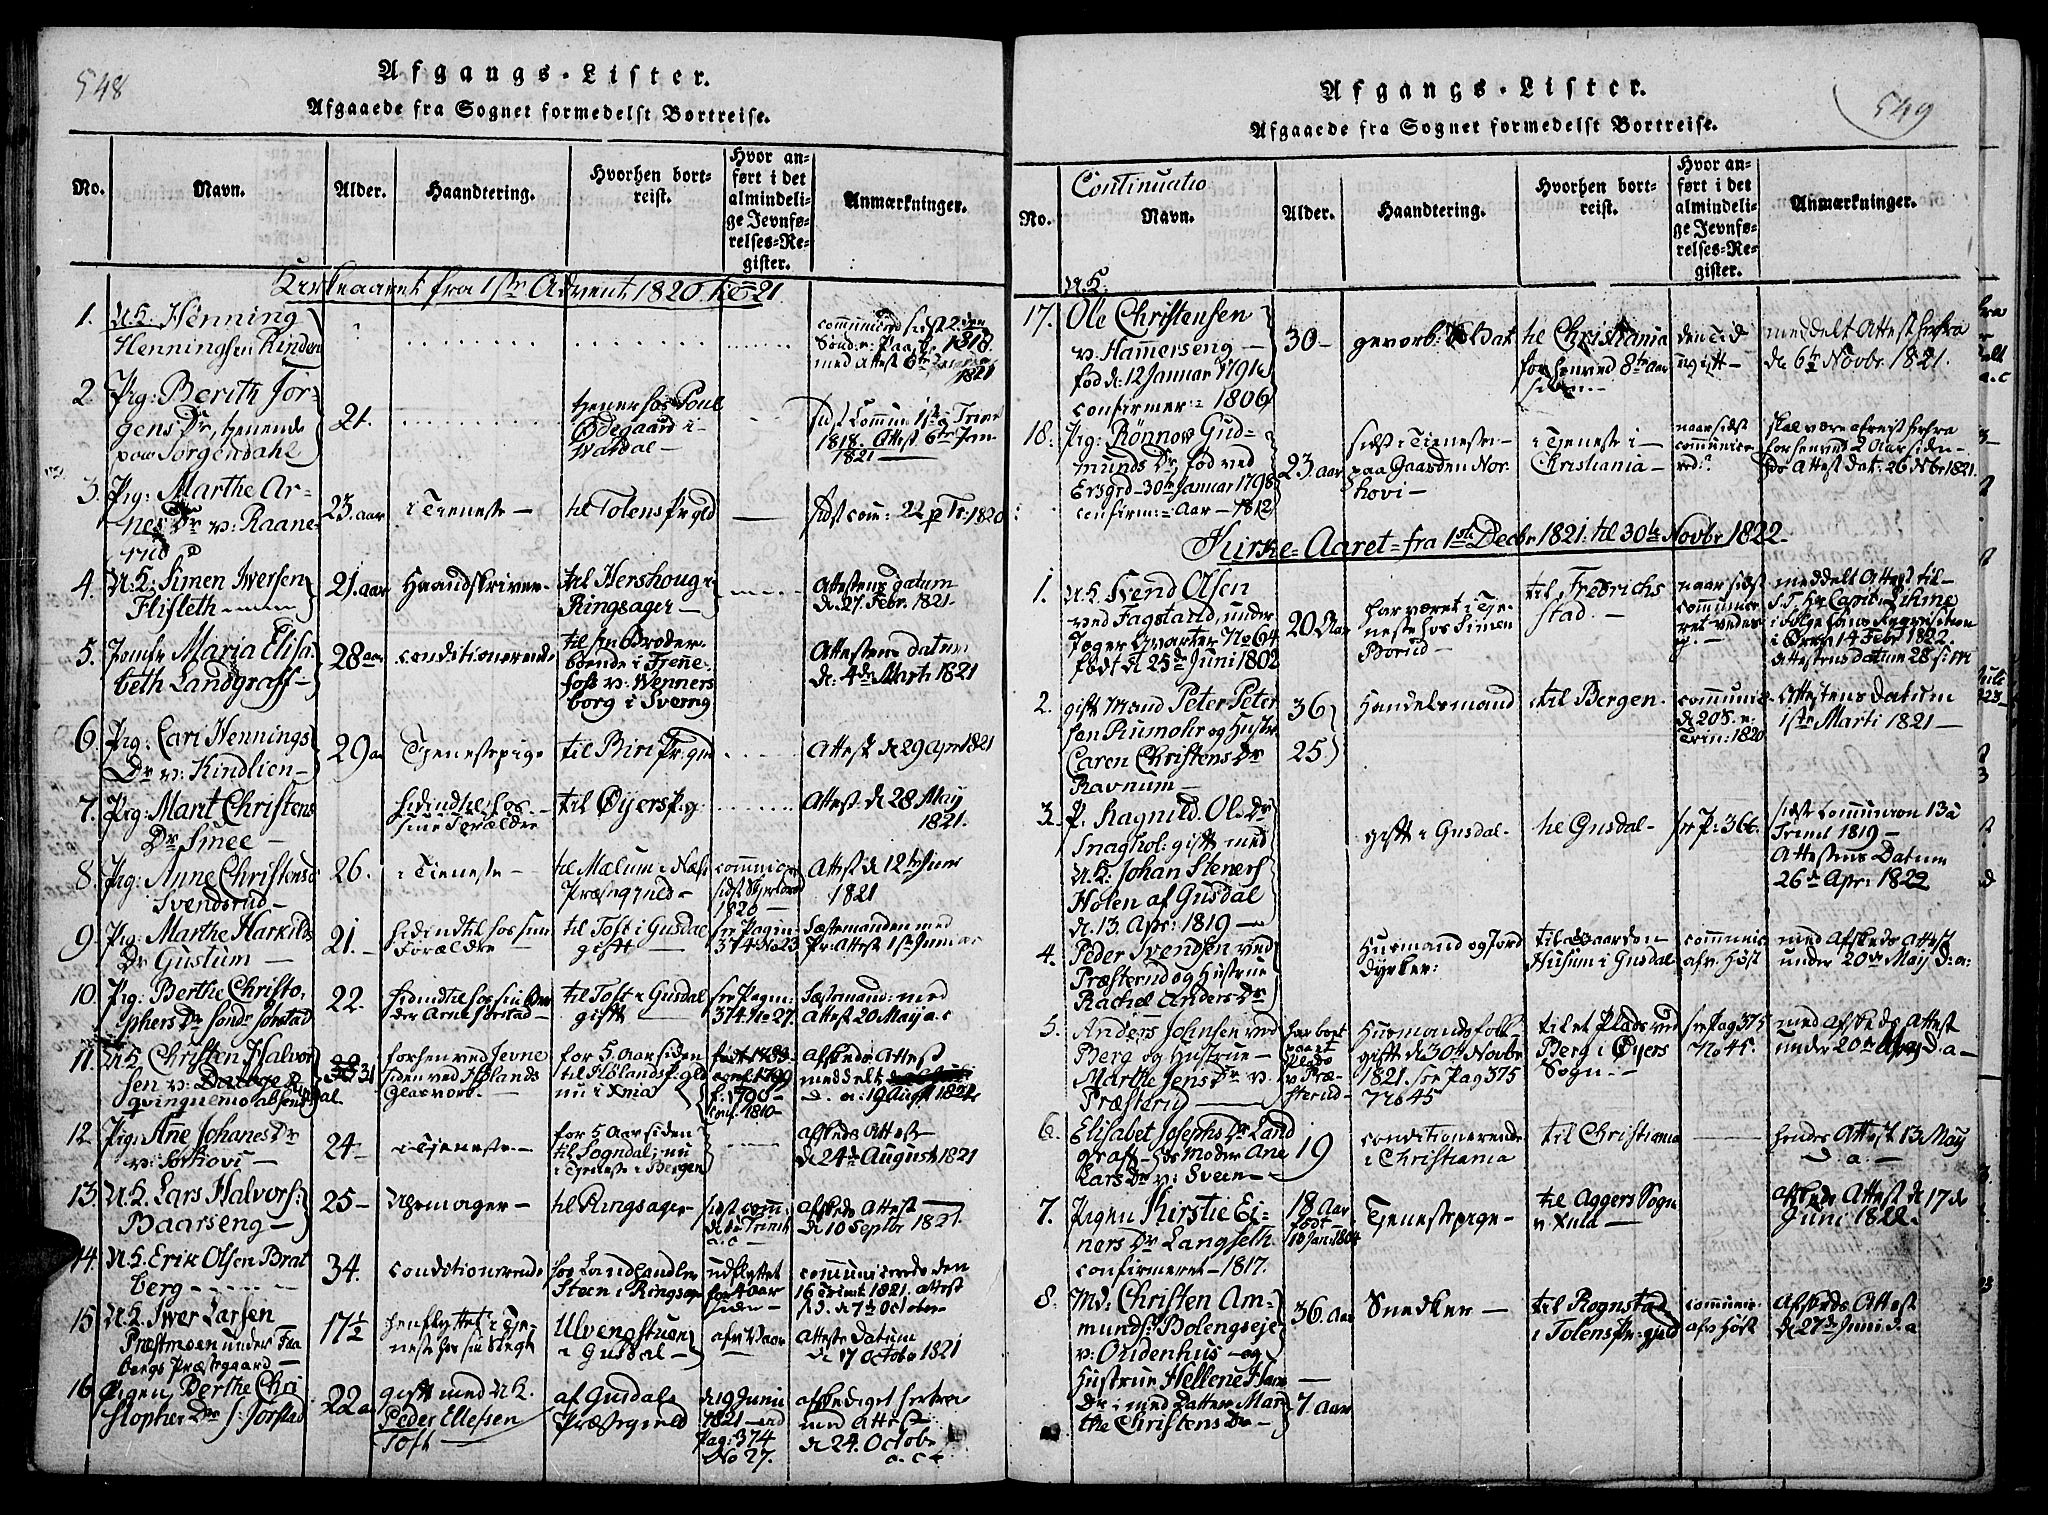 SAH, Fåberg prestekontor, Ministerialbok nr. 3, 1818-1833, s. 548-549